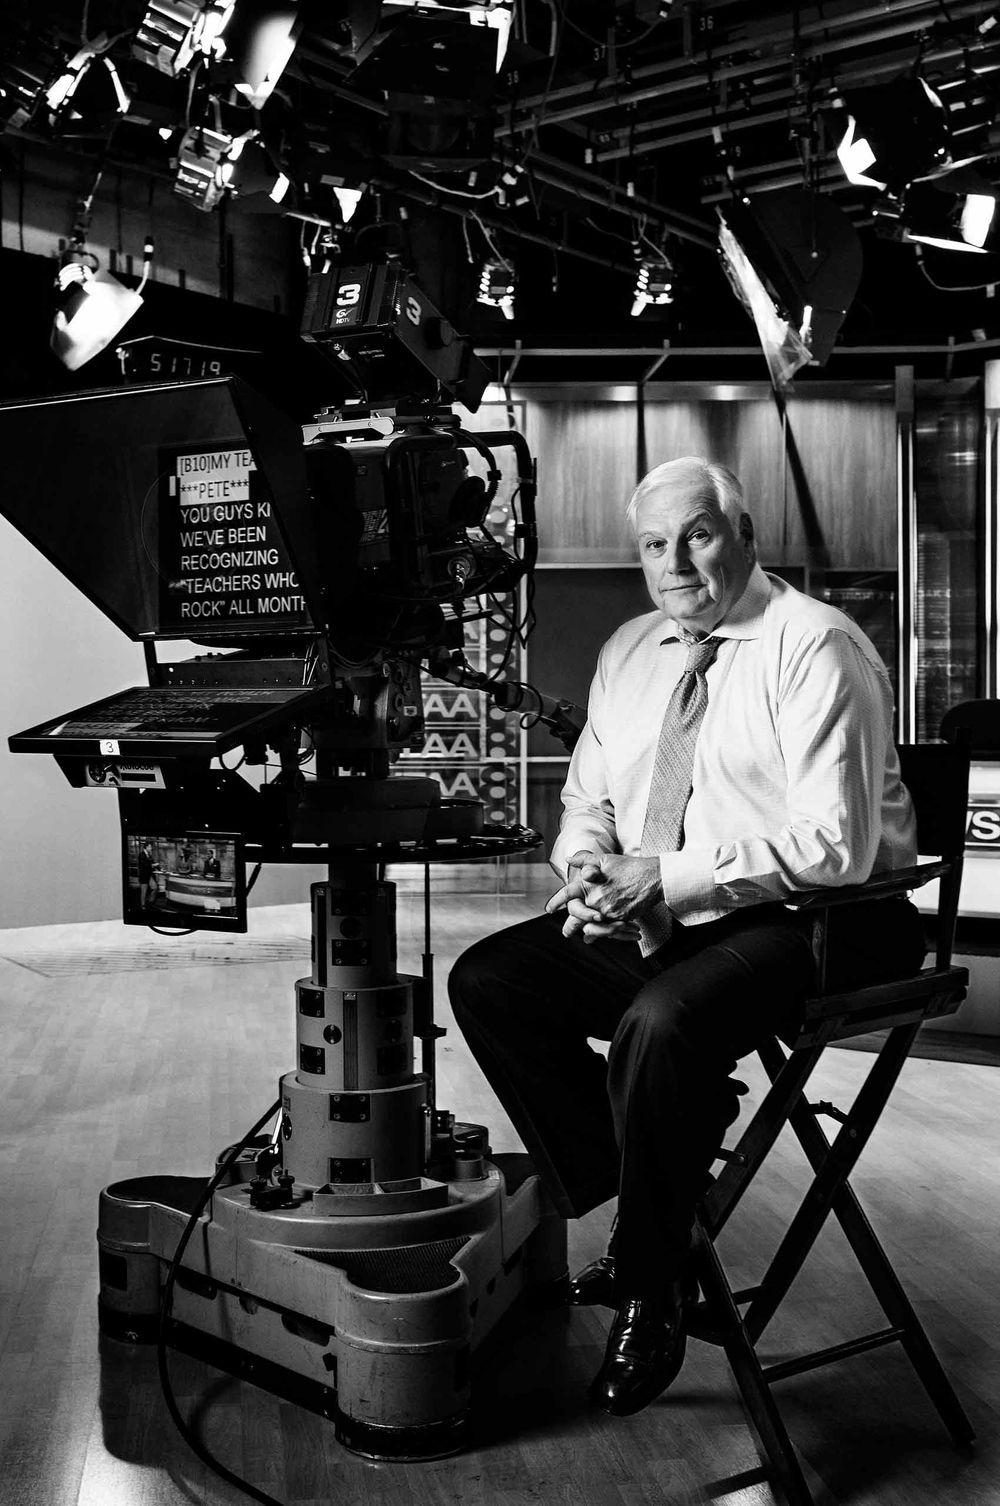 Sportscaster-DaleHansen-in-television-studio-Dallas-by-HenrikOlundPhotography.jpg